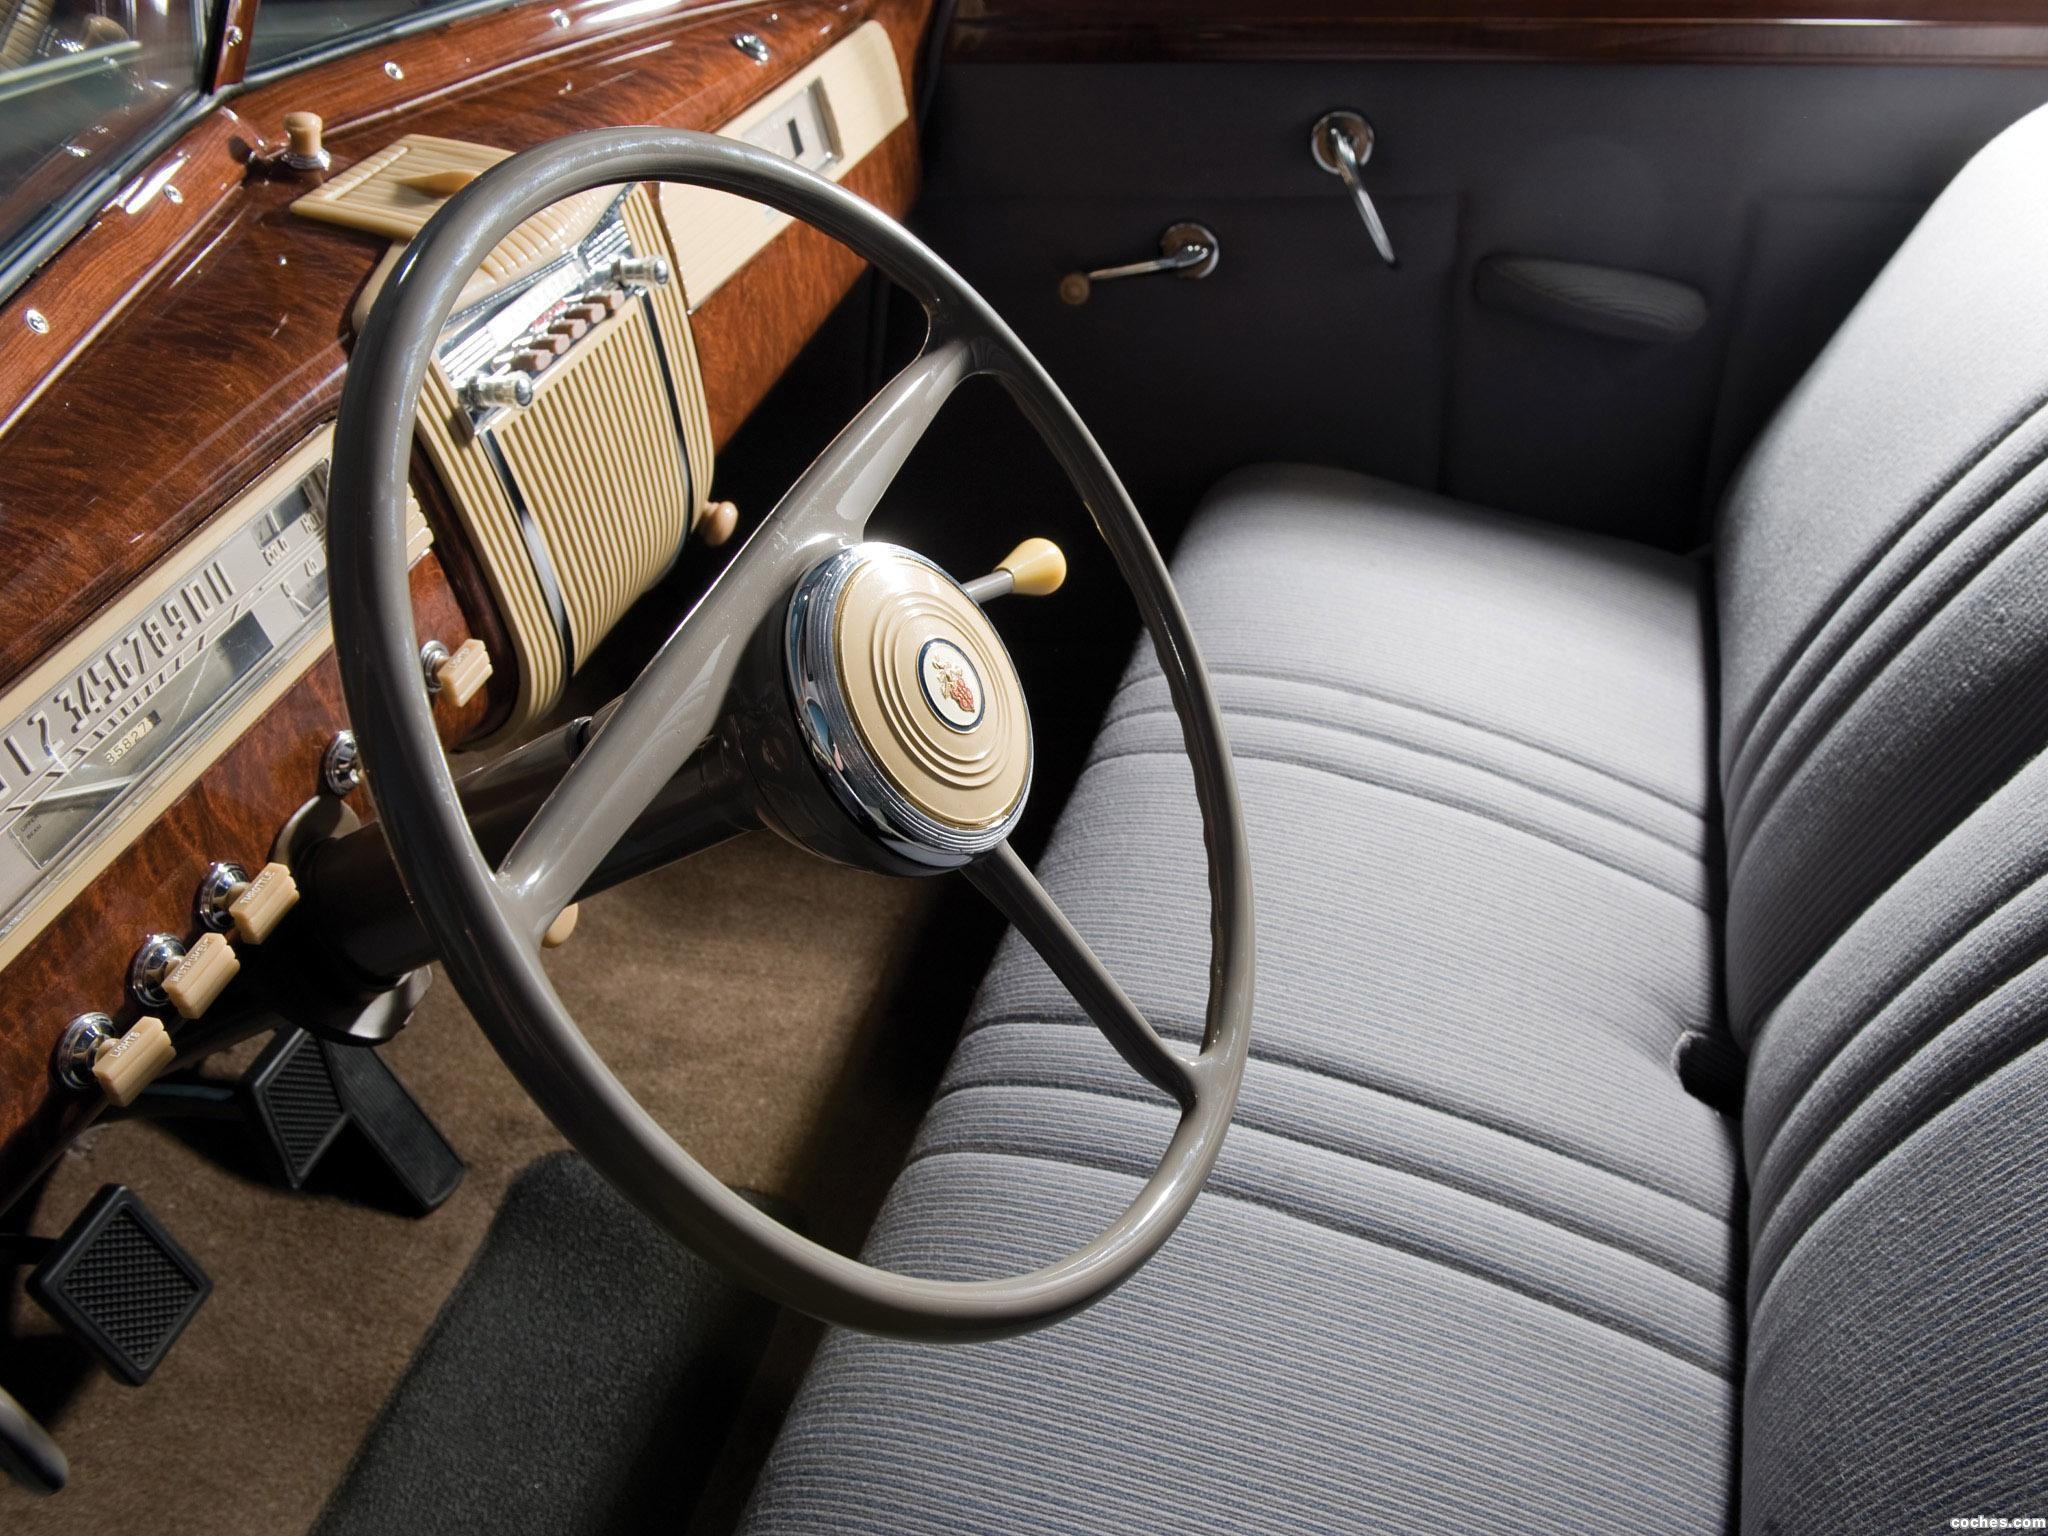 Foto 1 de Packard 110 2 puertas Touring Sedan 1941